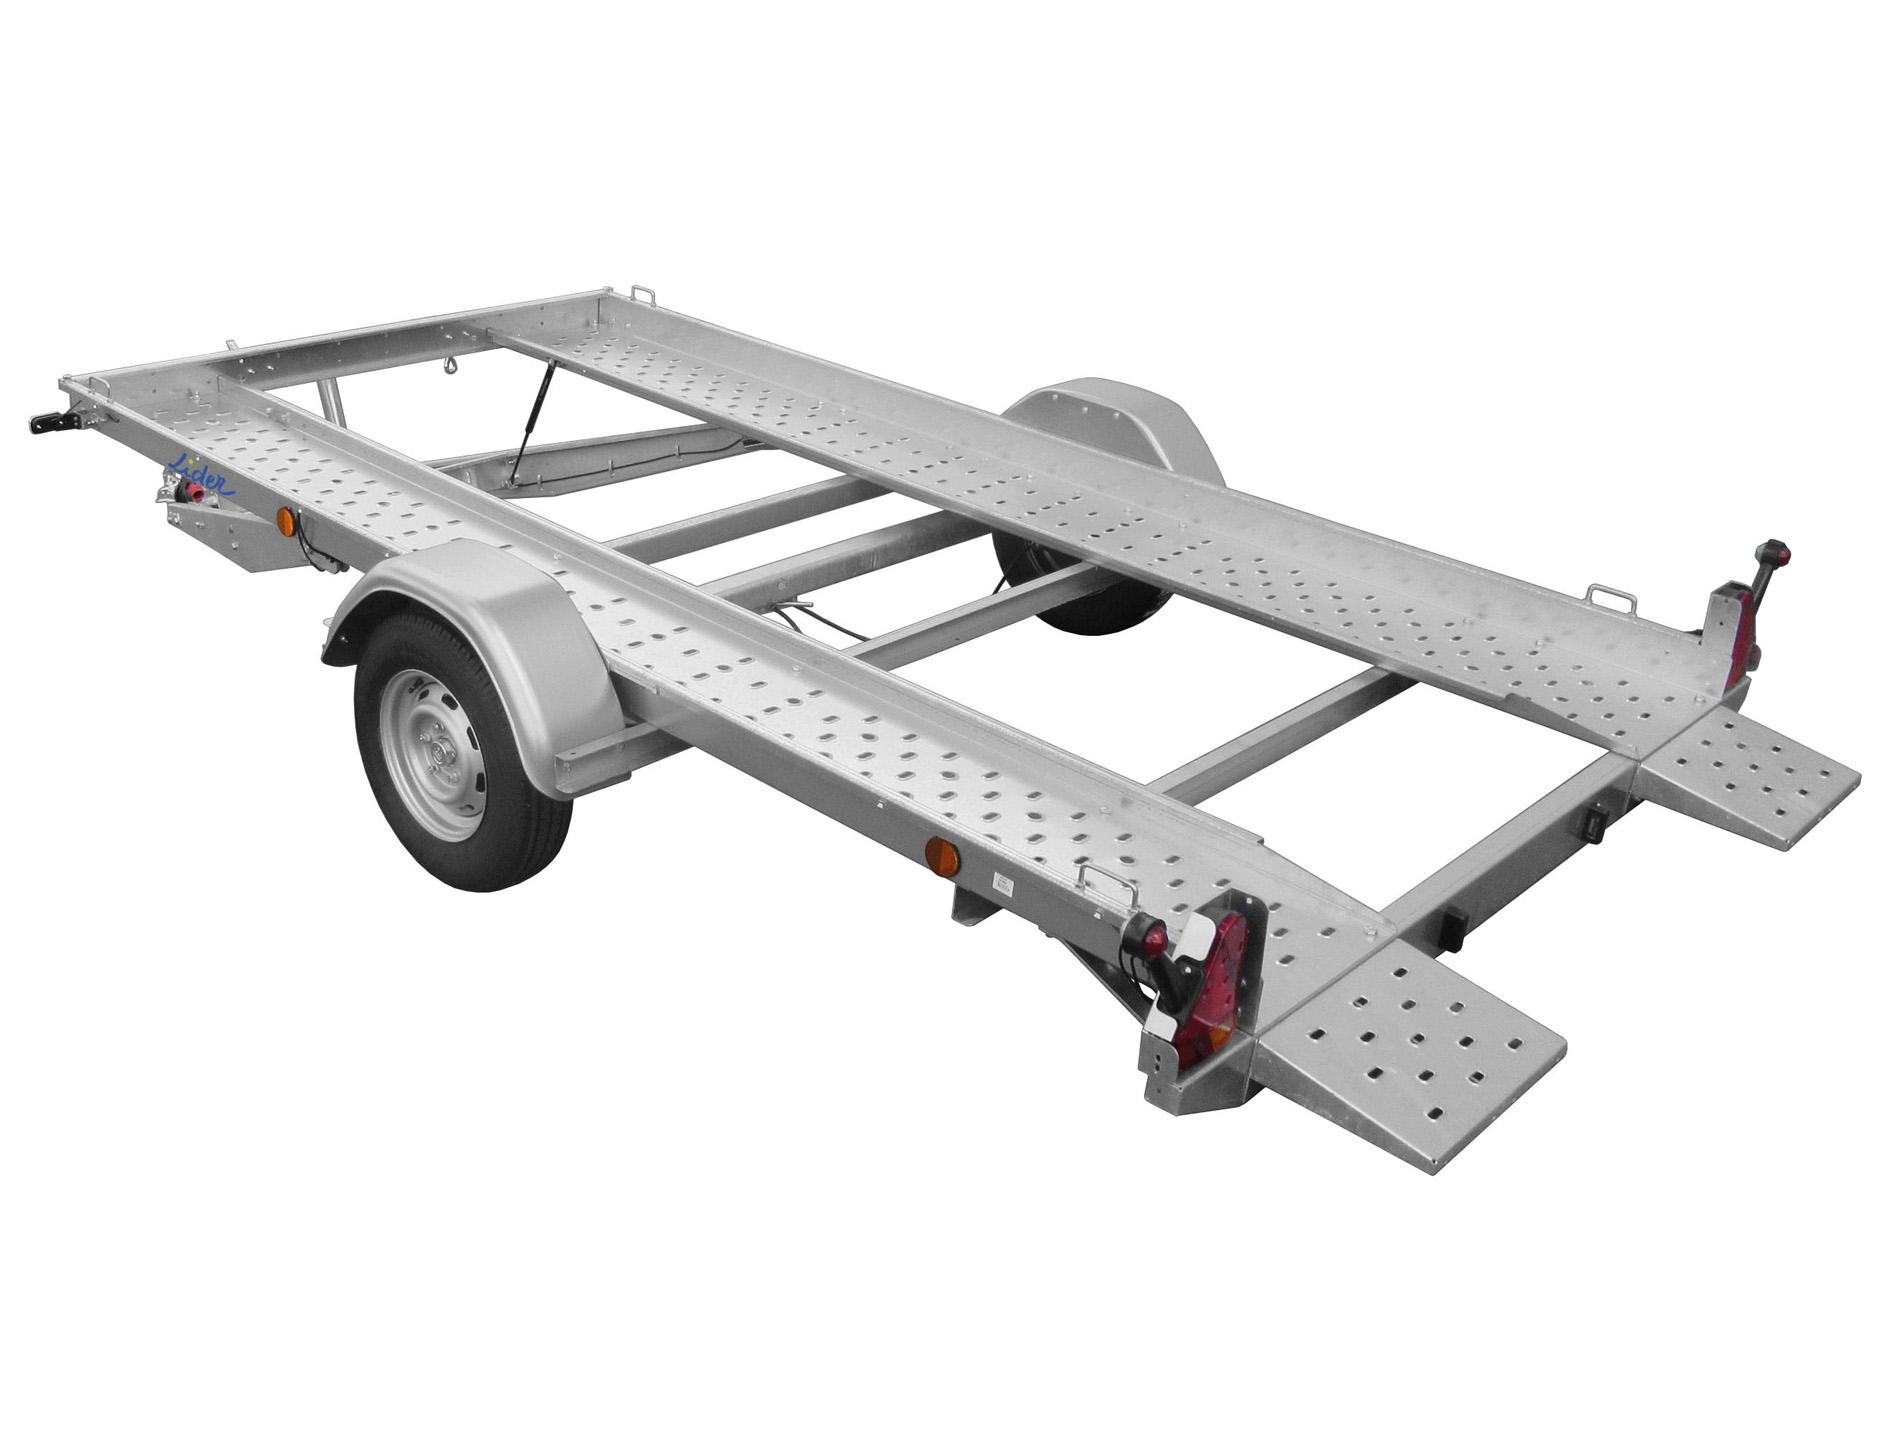 Remorque porte voiture avec rampes 1300kg lider remorques entretien auto - Remorque lider porte voiture ...